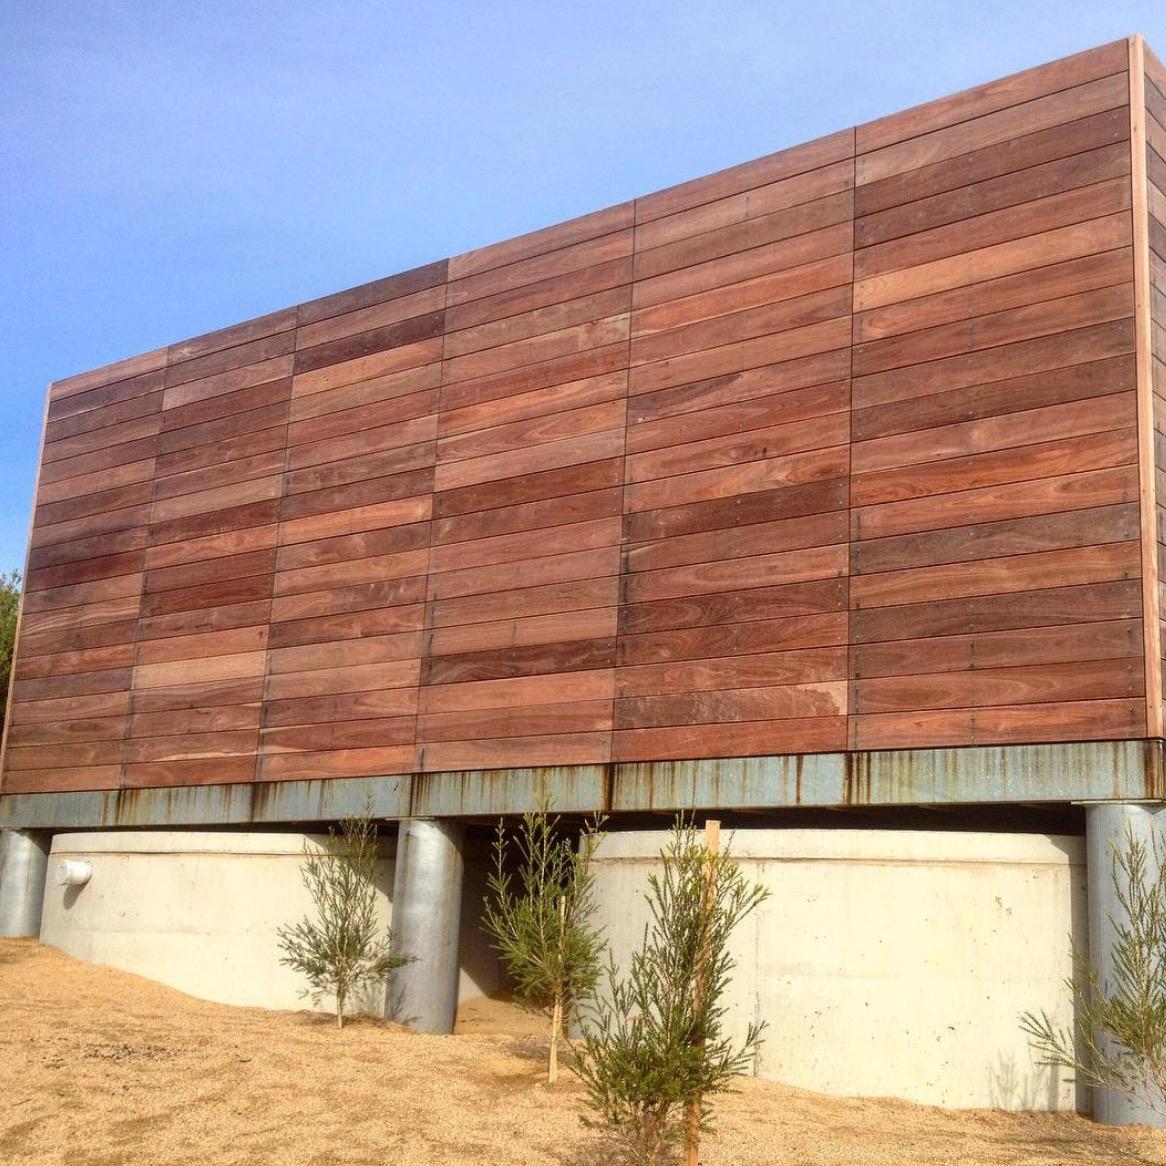 Jarrah Timber Suppliers Melbourne